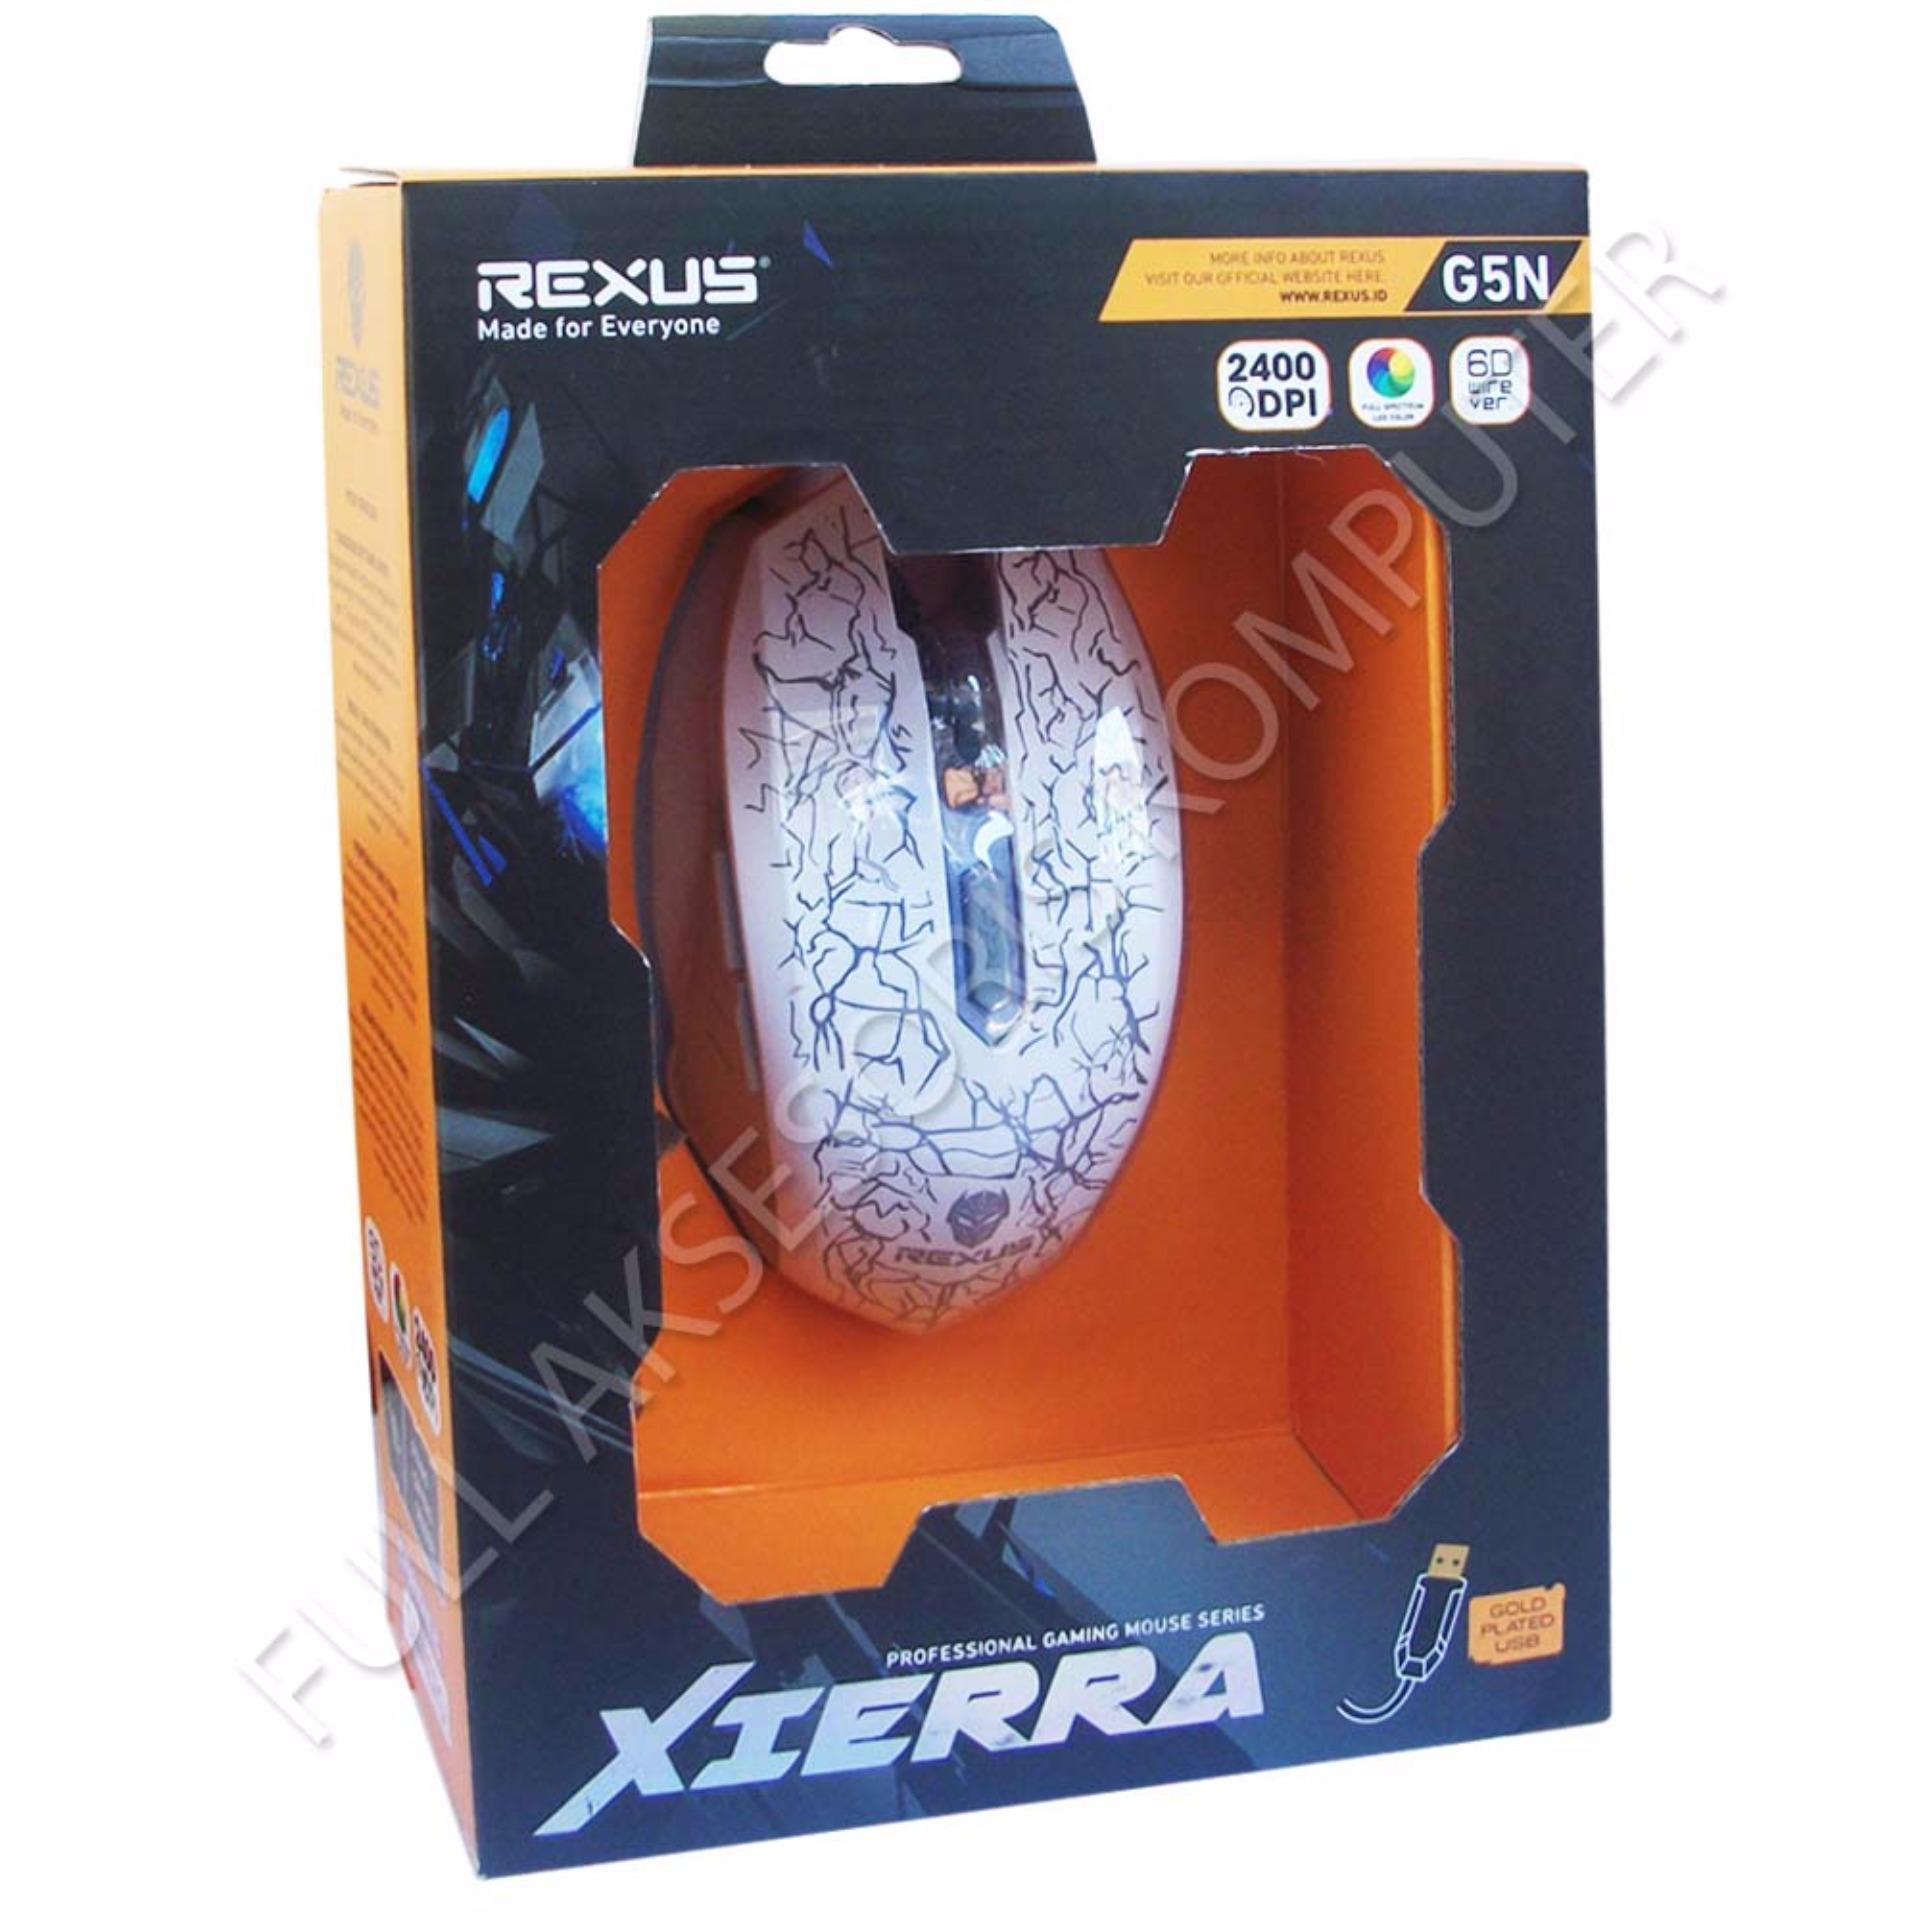 Flash Sale Rexus G5n Mouse Gaming 6d Usb With Led Putih Eshop Checker G4